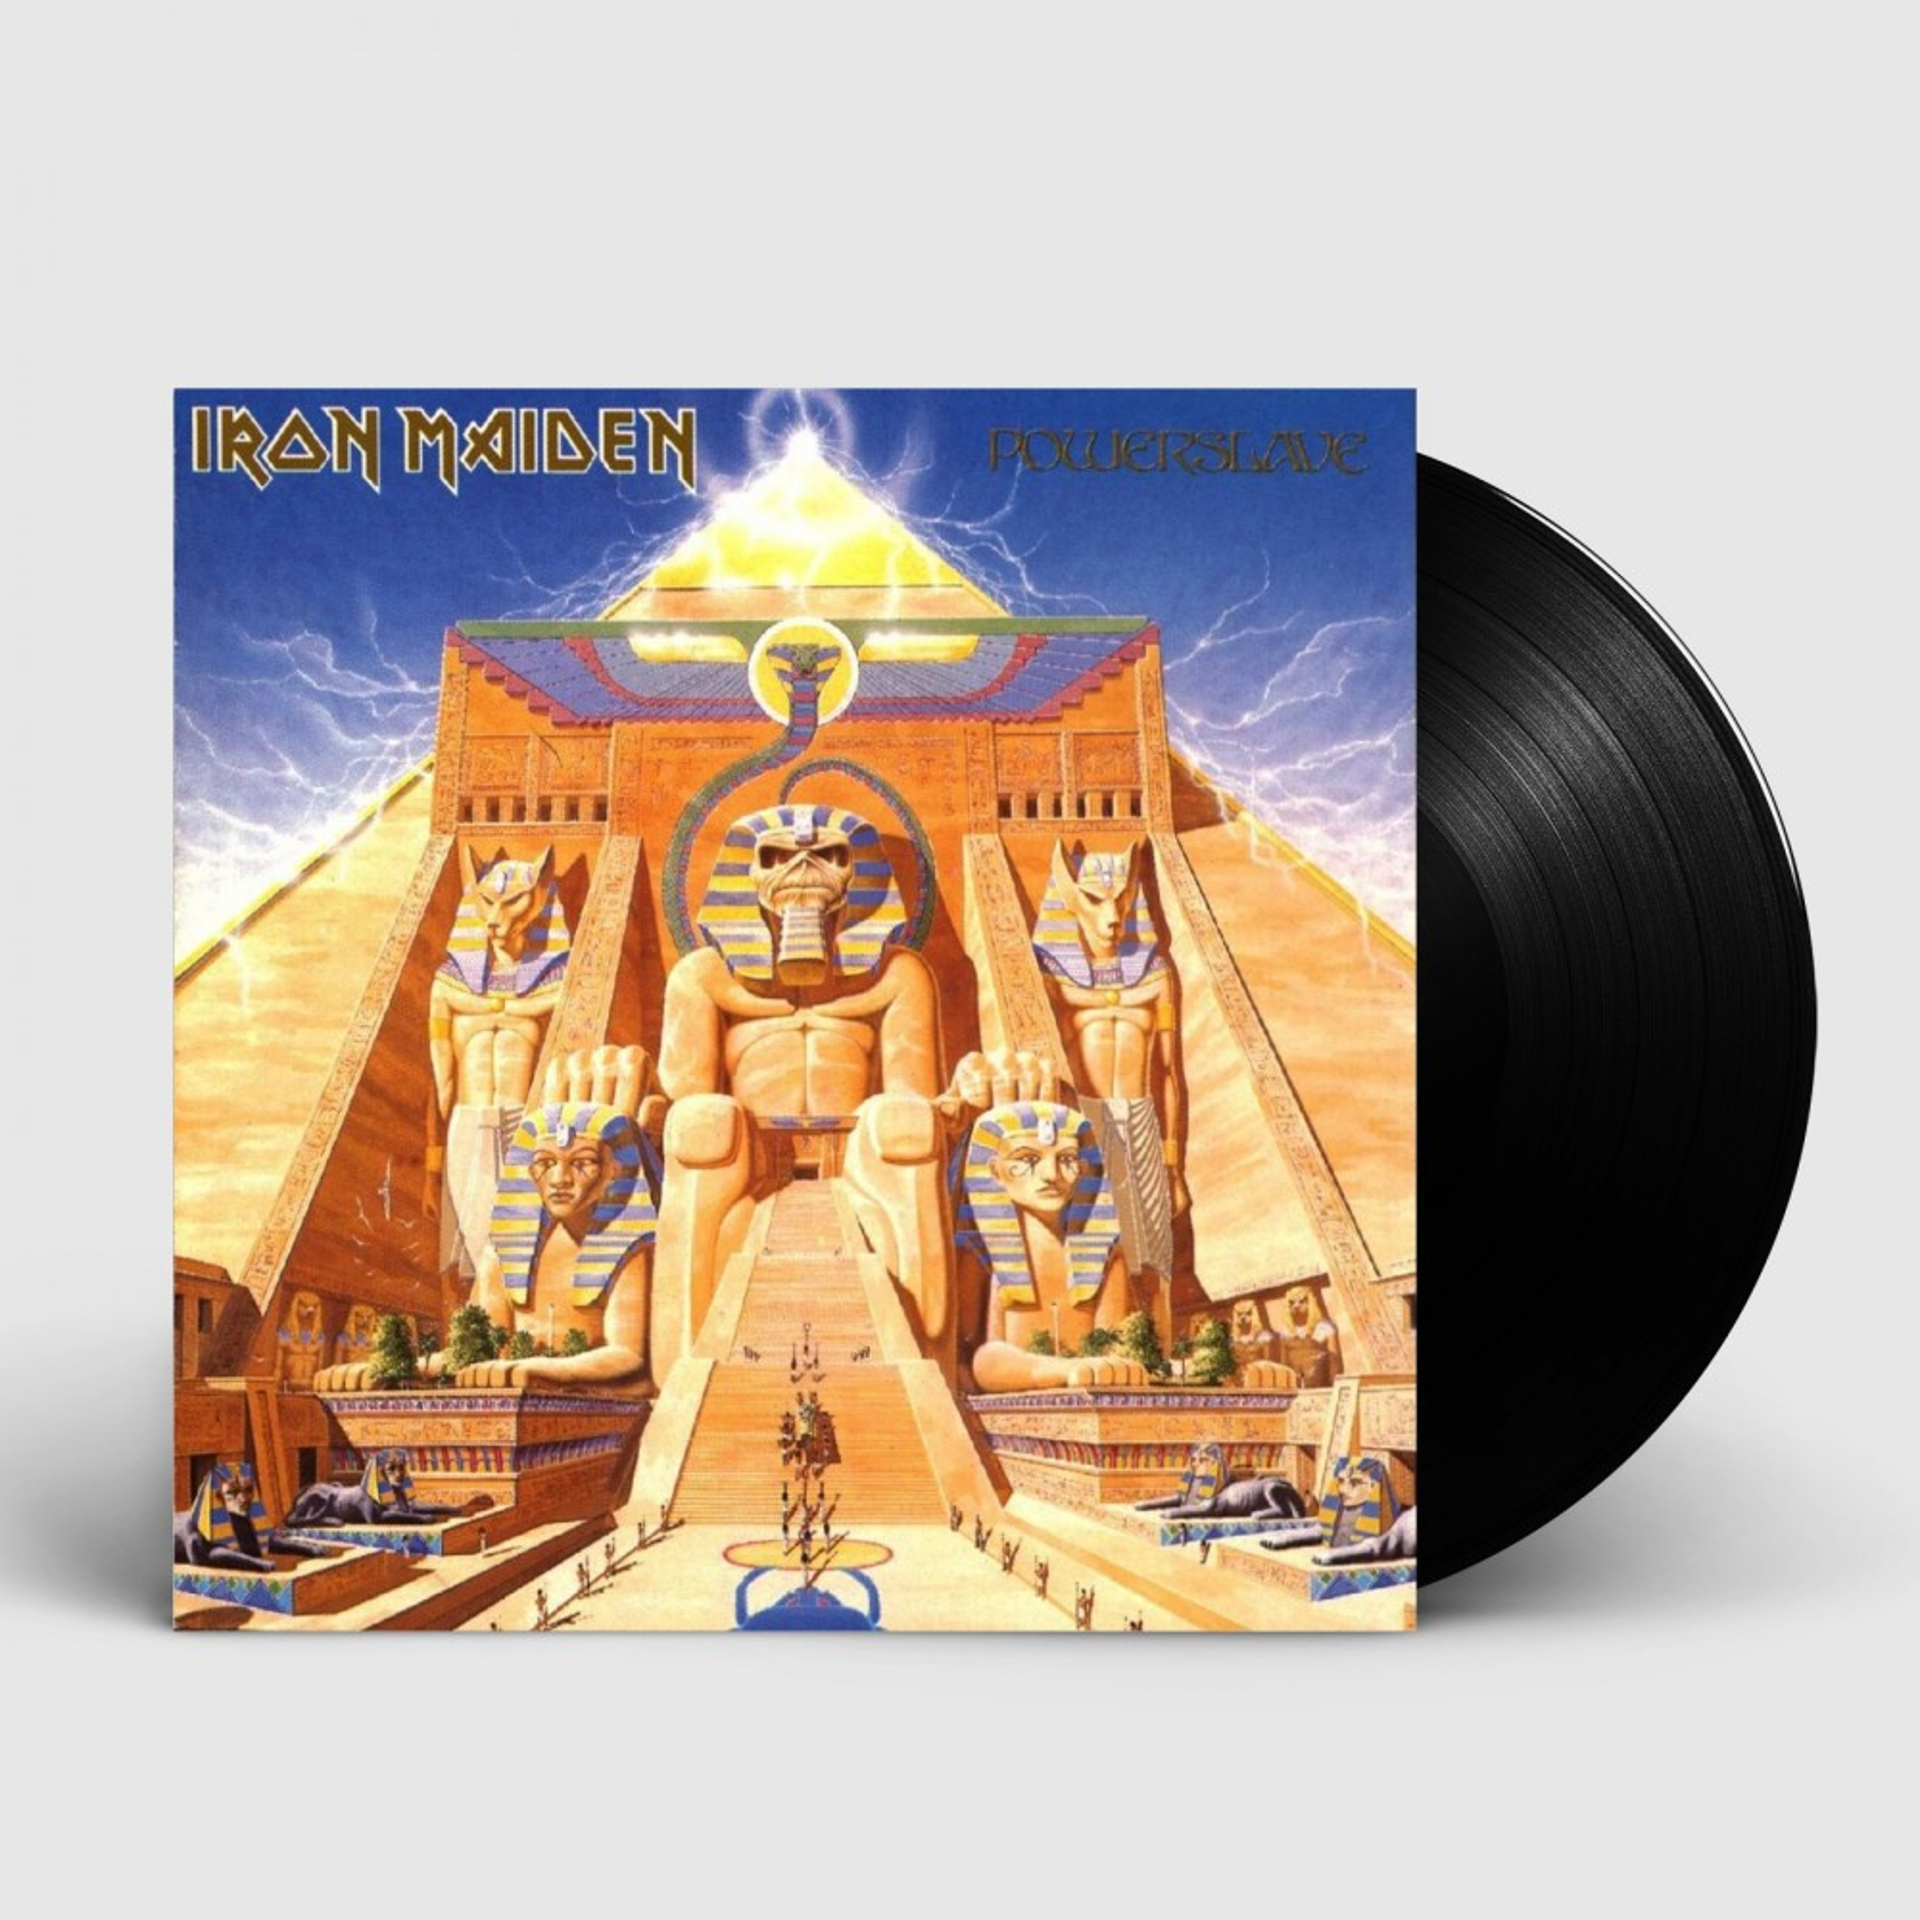 IRON MAIDEN - Powerslave [BLACK] (LP)